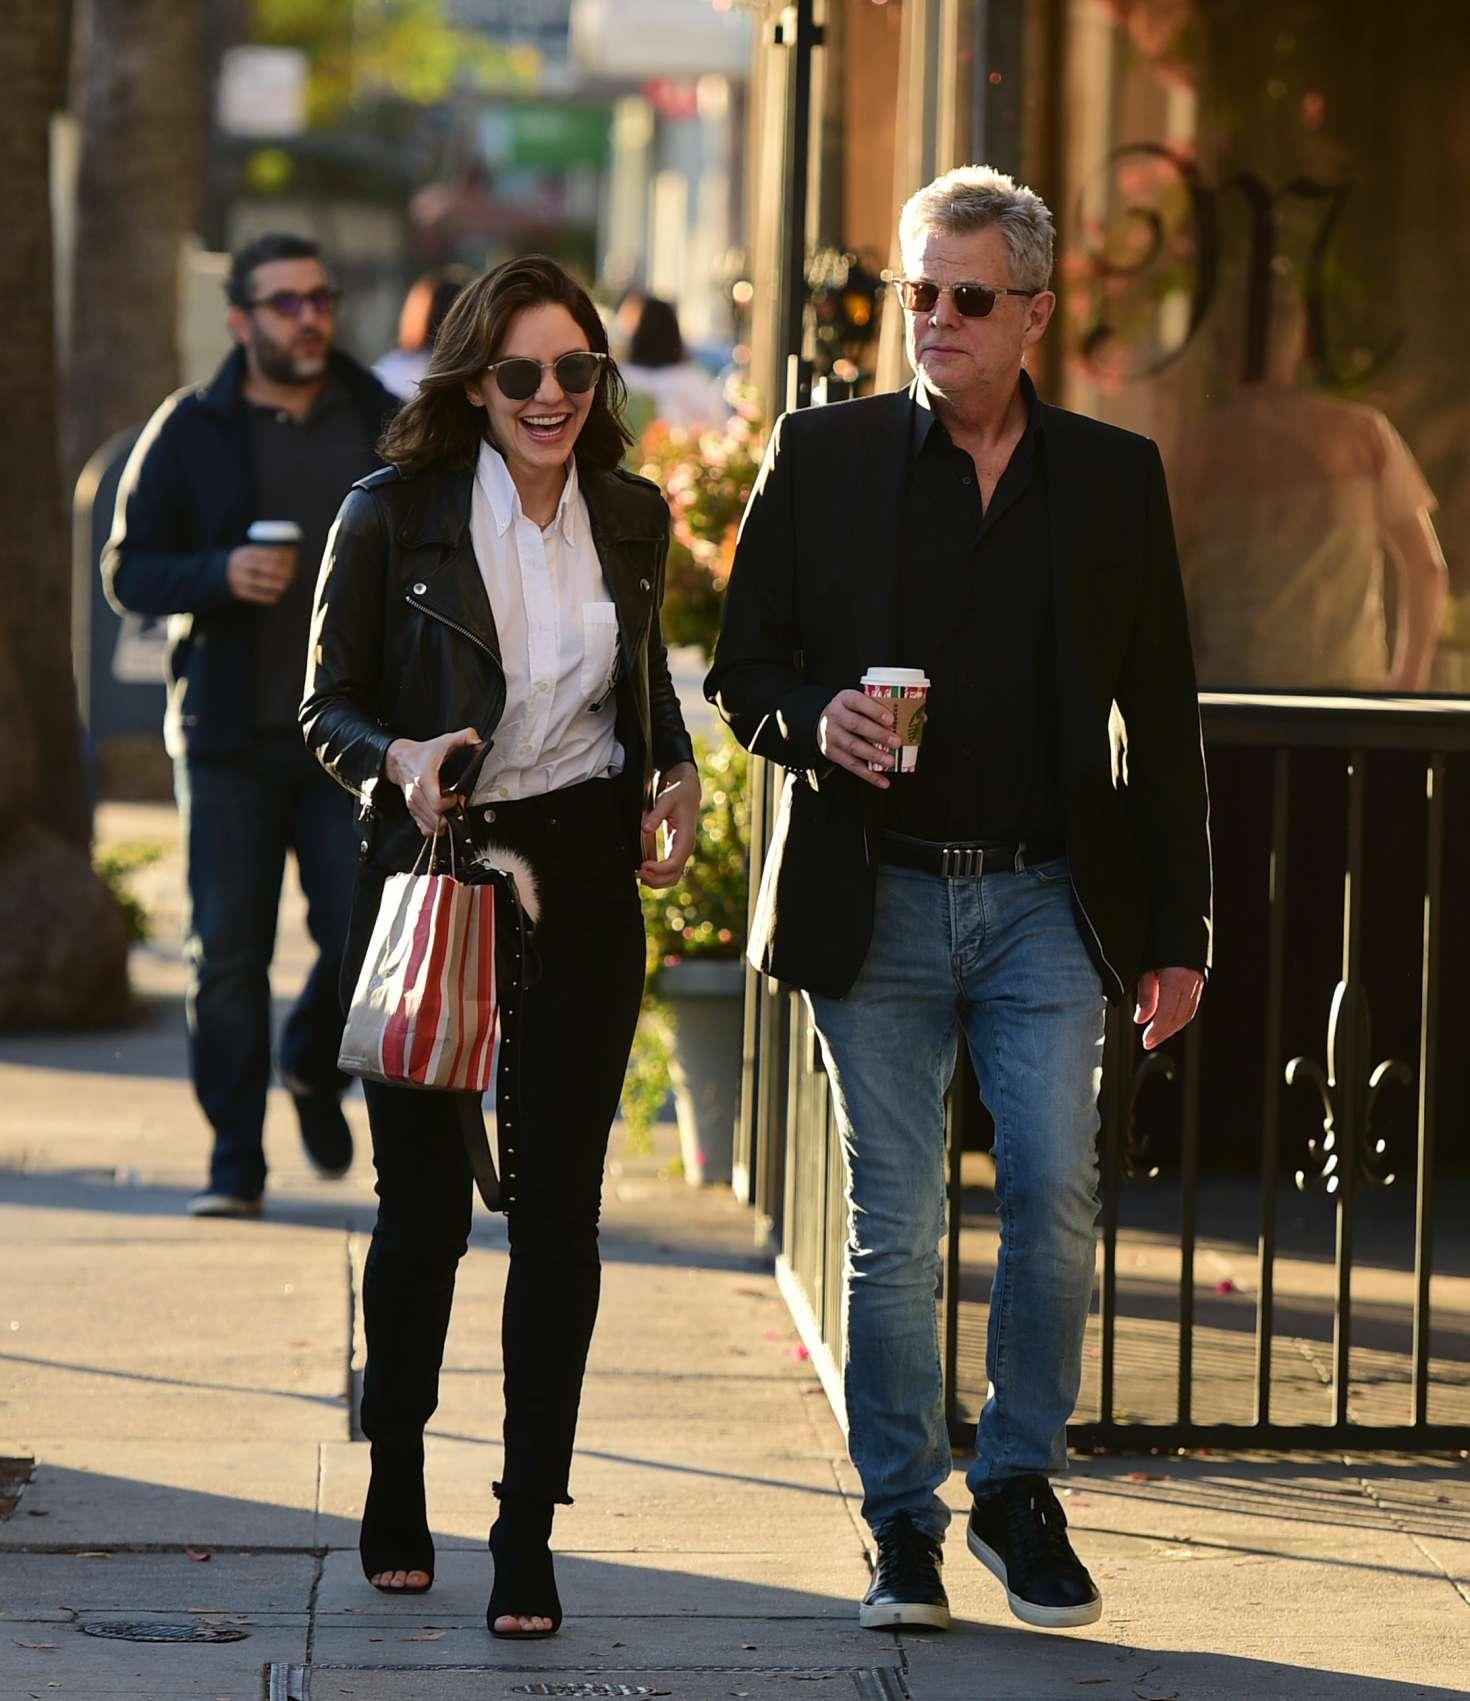 Katharine McPhee 2018 : Katharine McPhee and David Foster: Shopping in Los Angeles -02